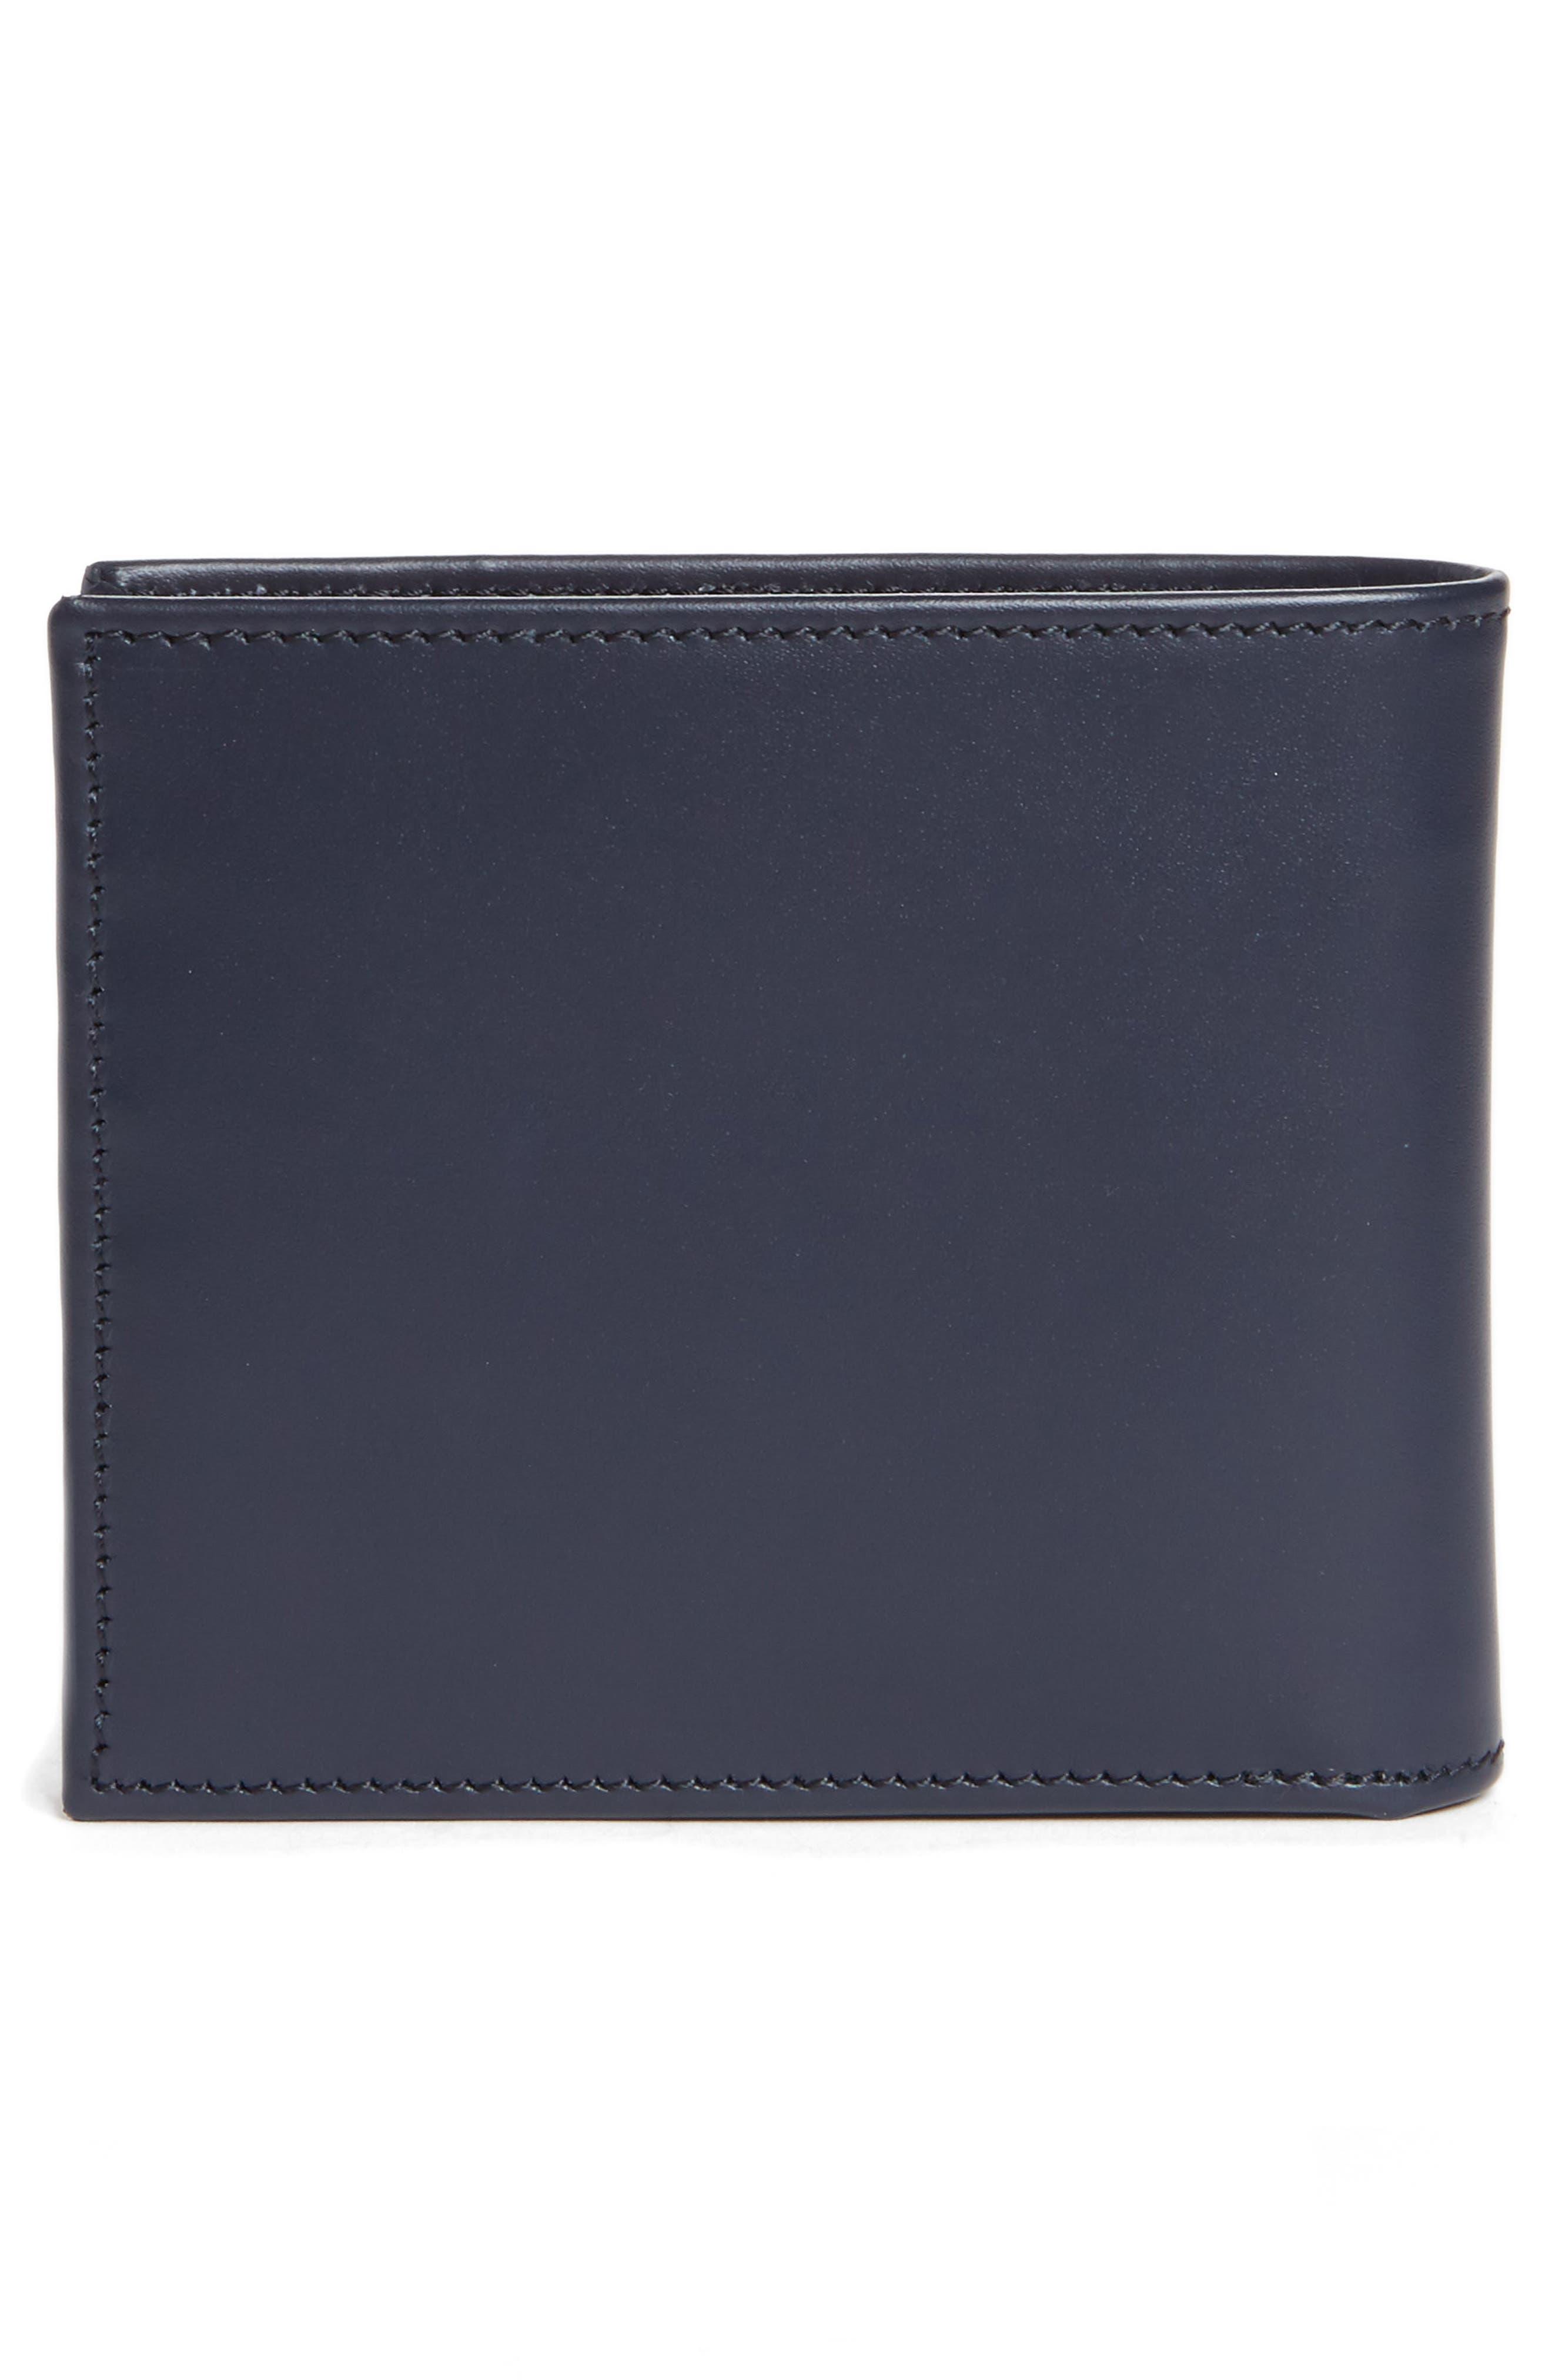 Multistripe Leather Wallet,                             Alternate thumbnail 6, color,